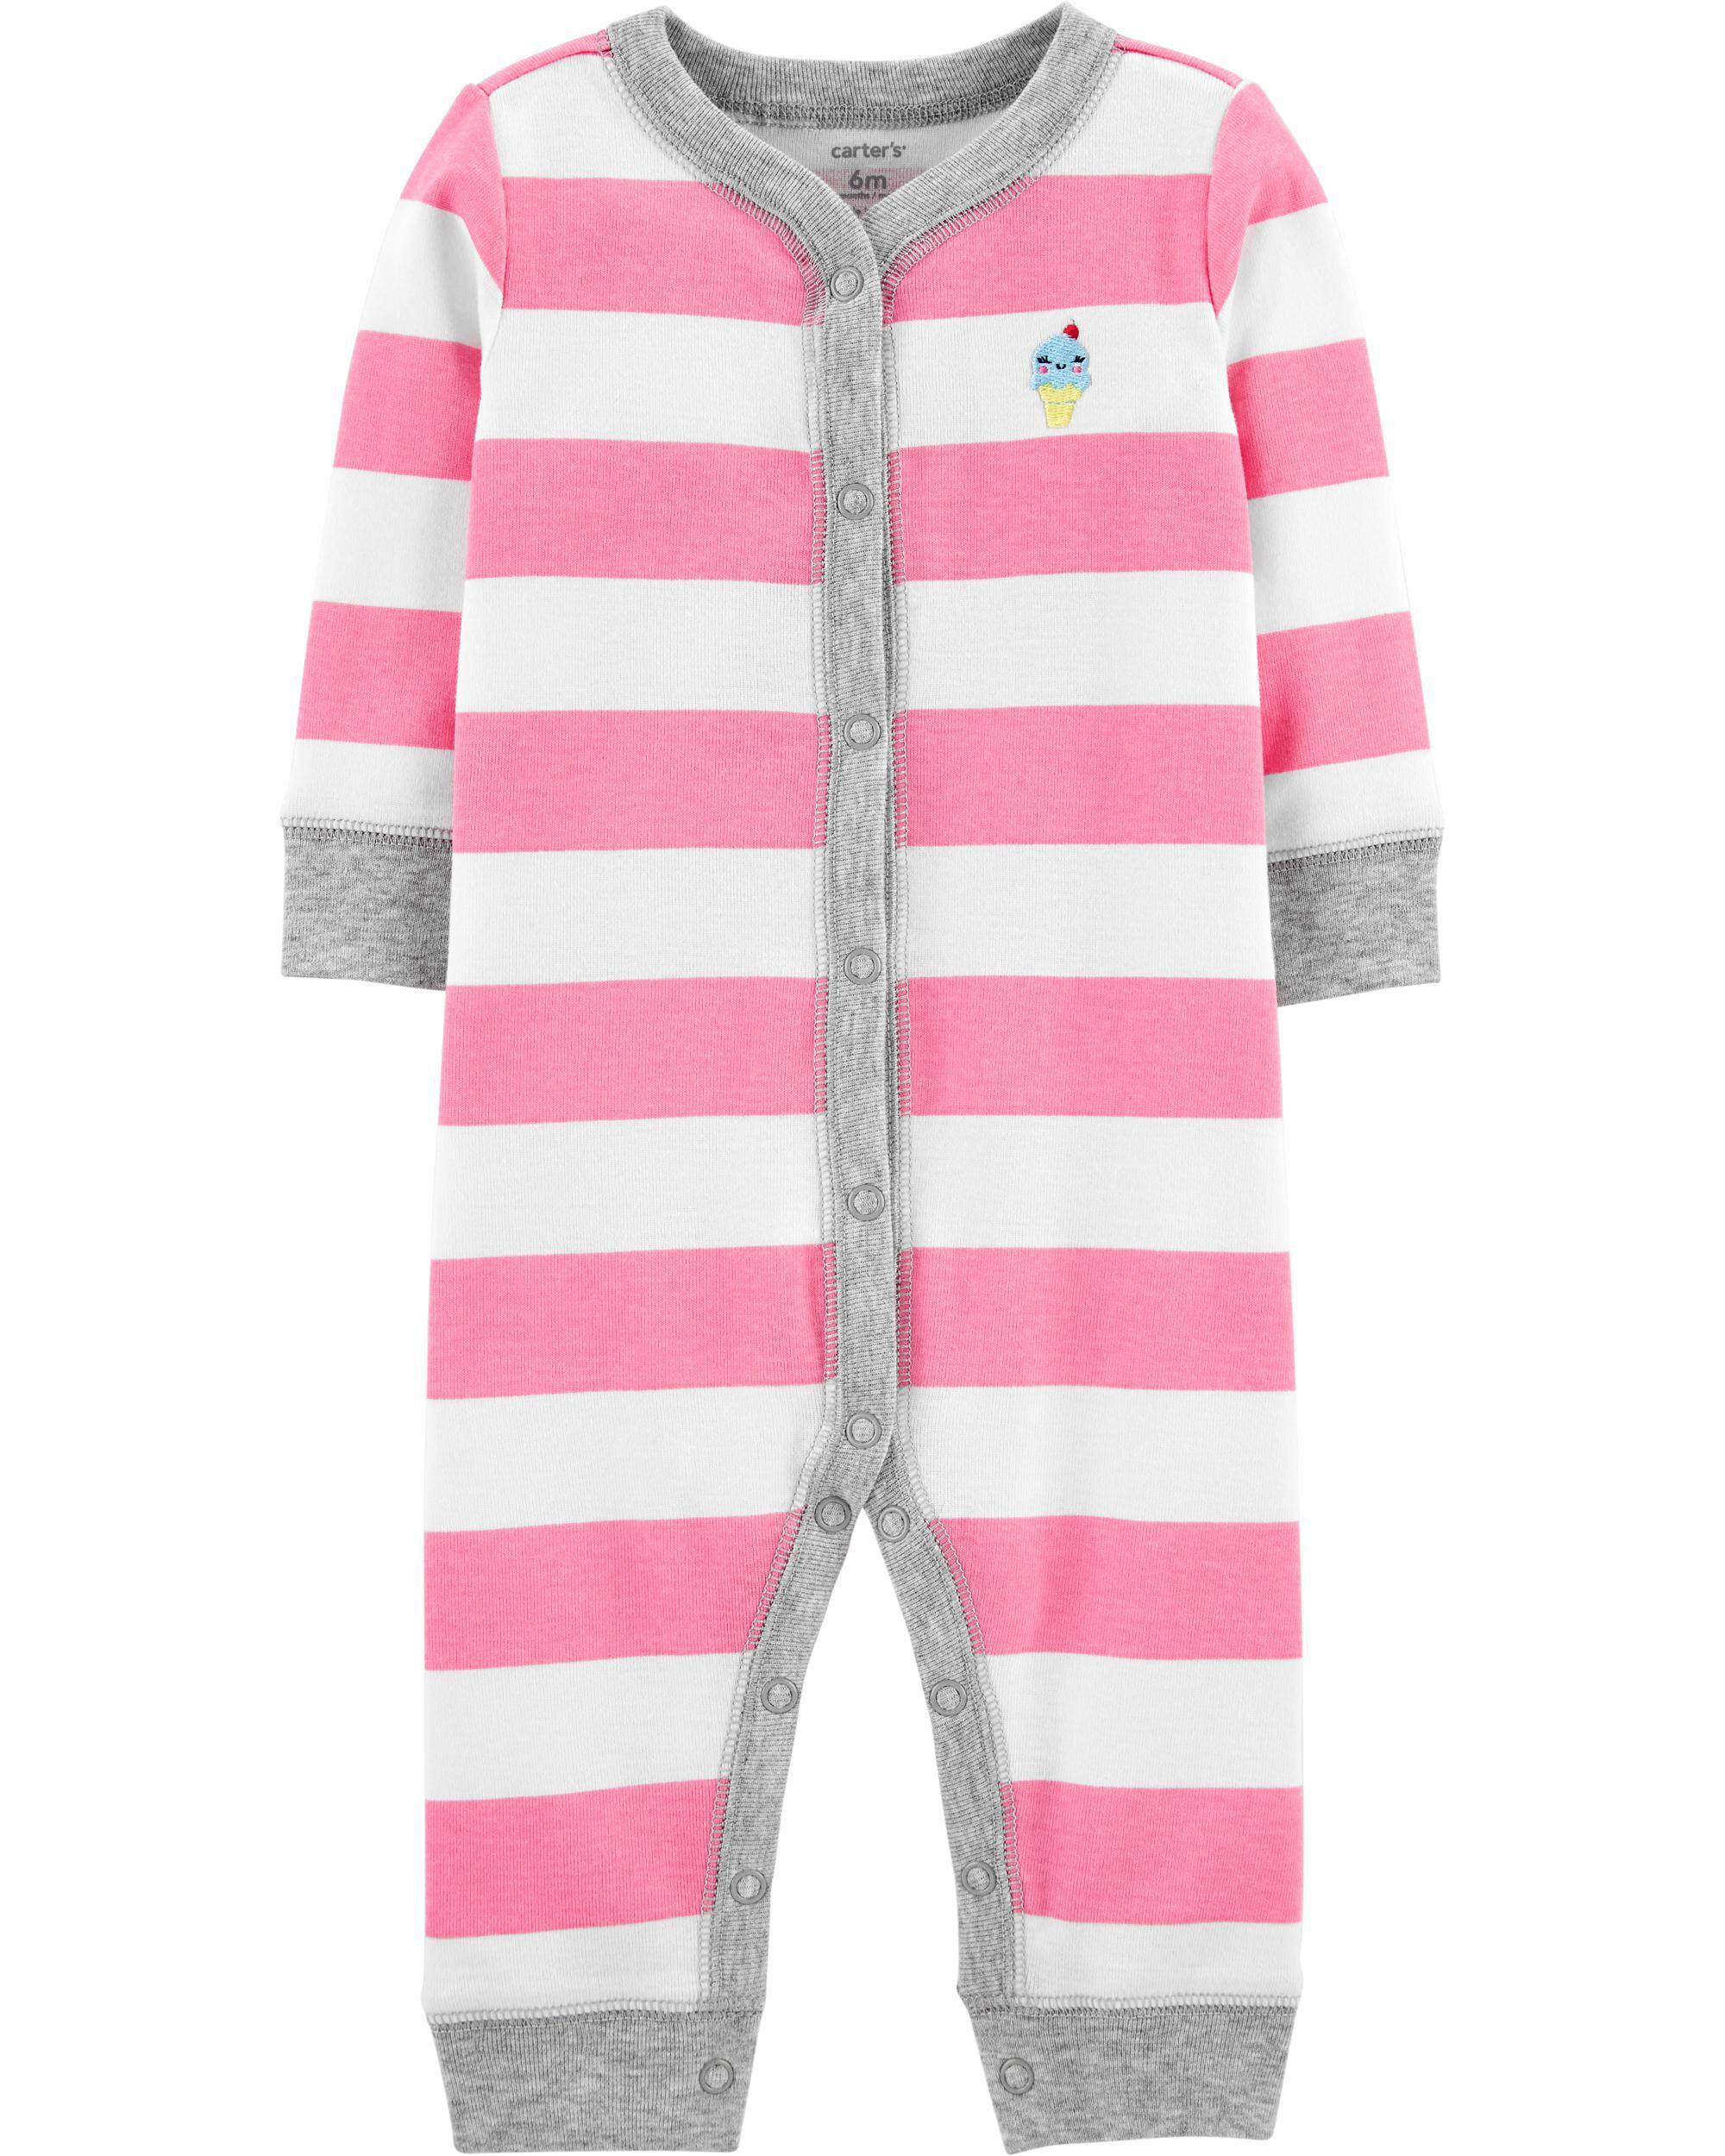 Carters Baby Boys 12-24 Months One Piece Dog Print Cotton Pajamas